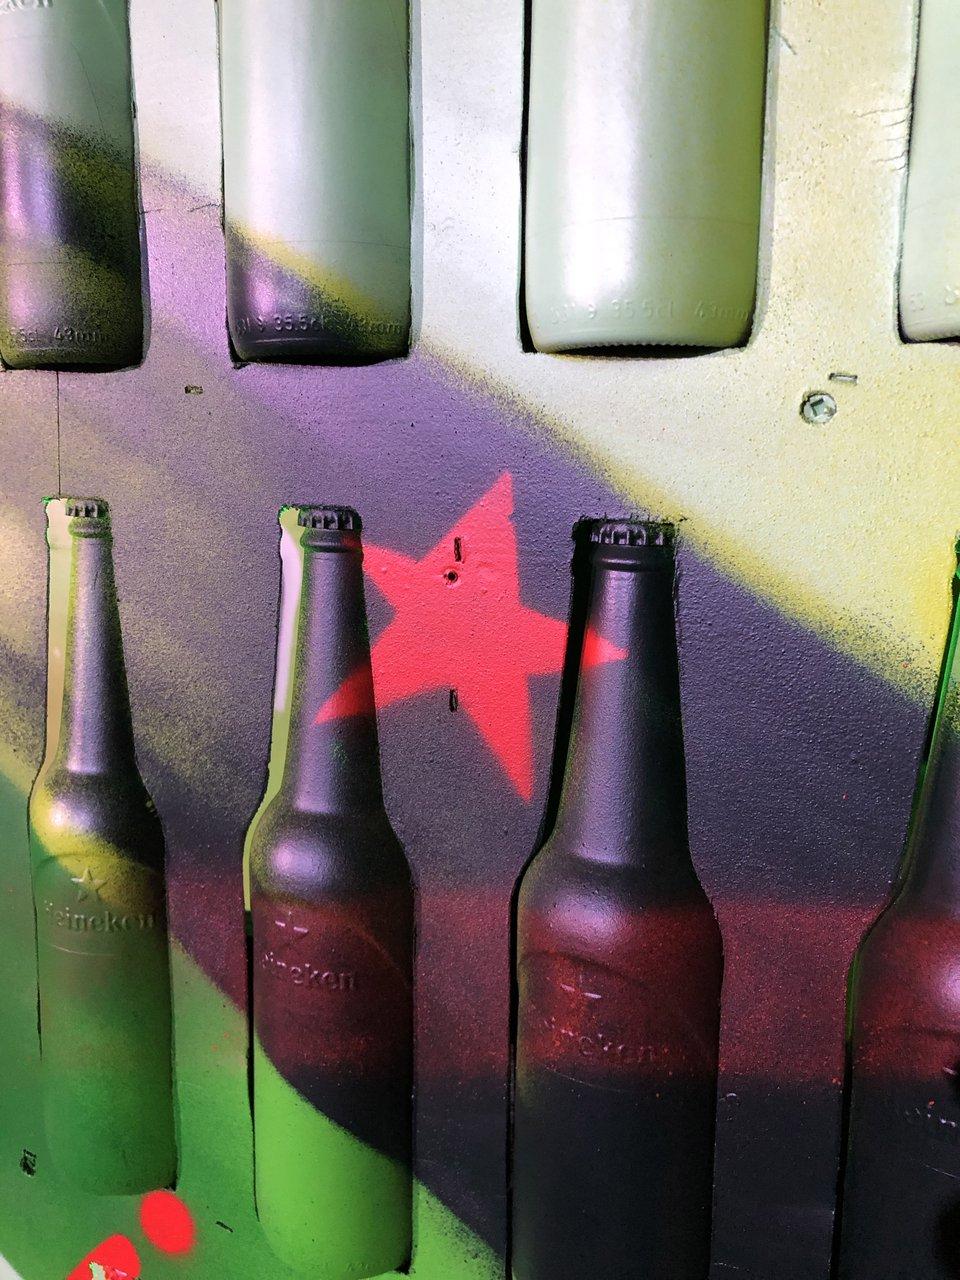 THE PARTY, by Heineken photo 1556490639902_IMG_9979.jpg